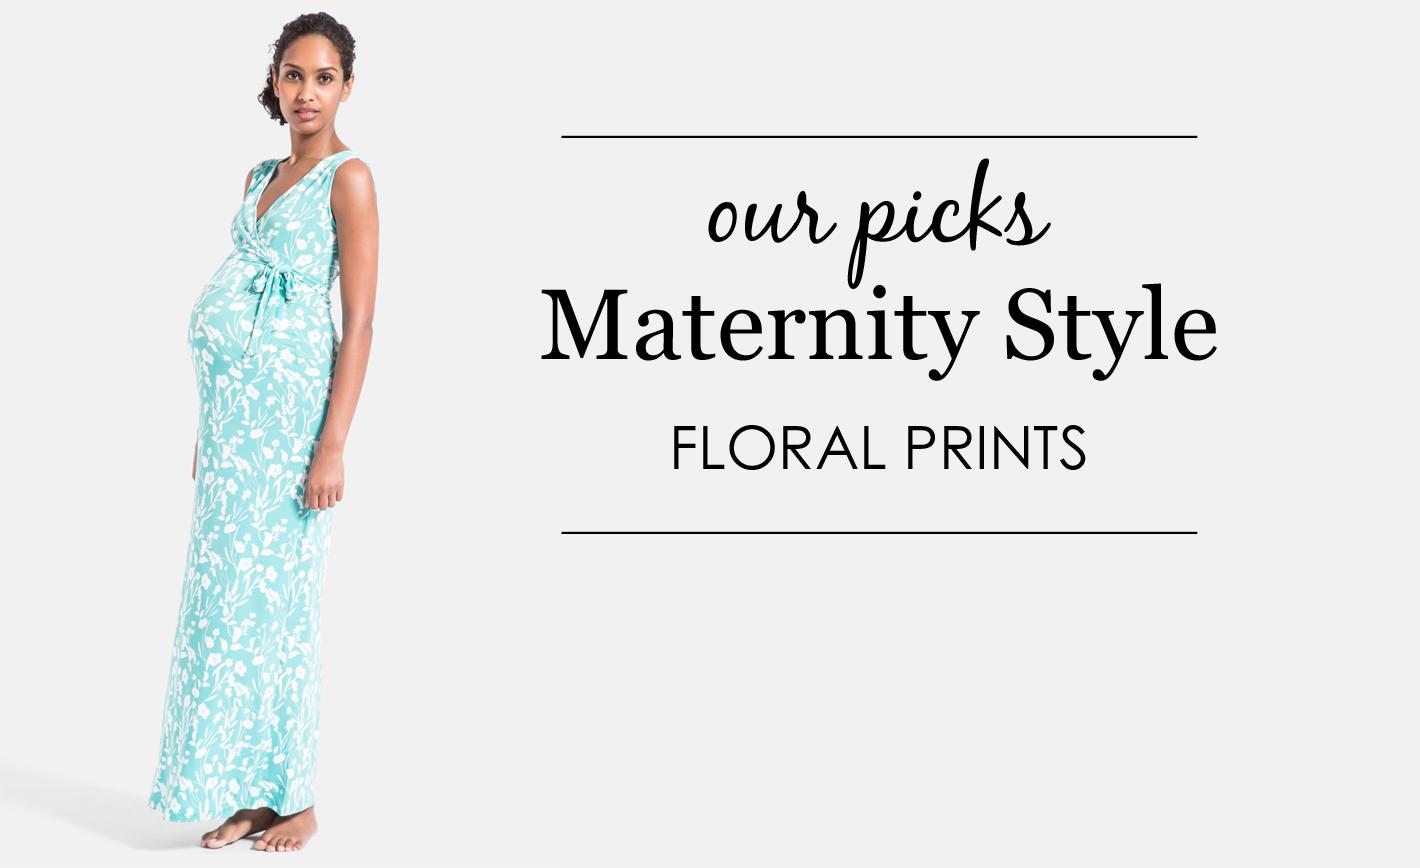 Maternity Floral Prints